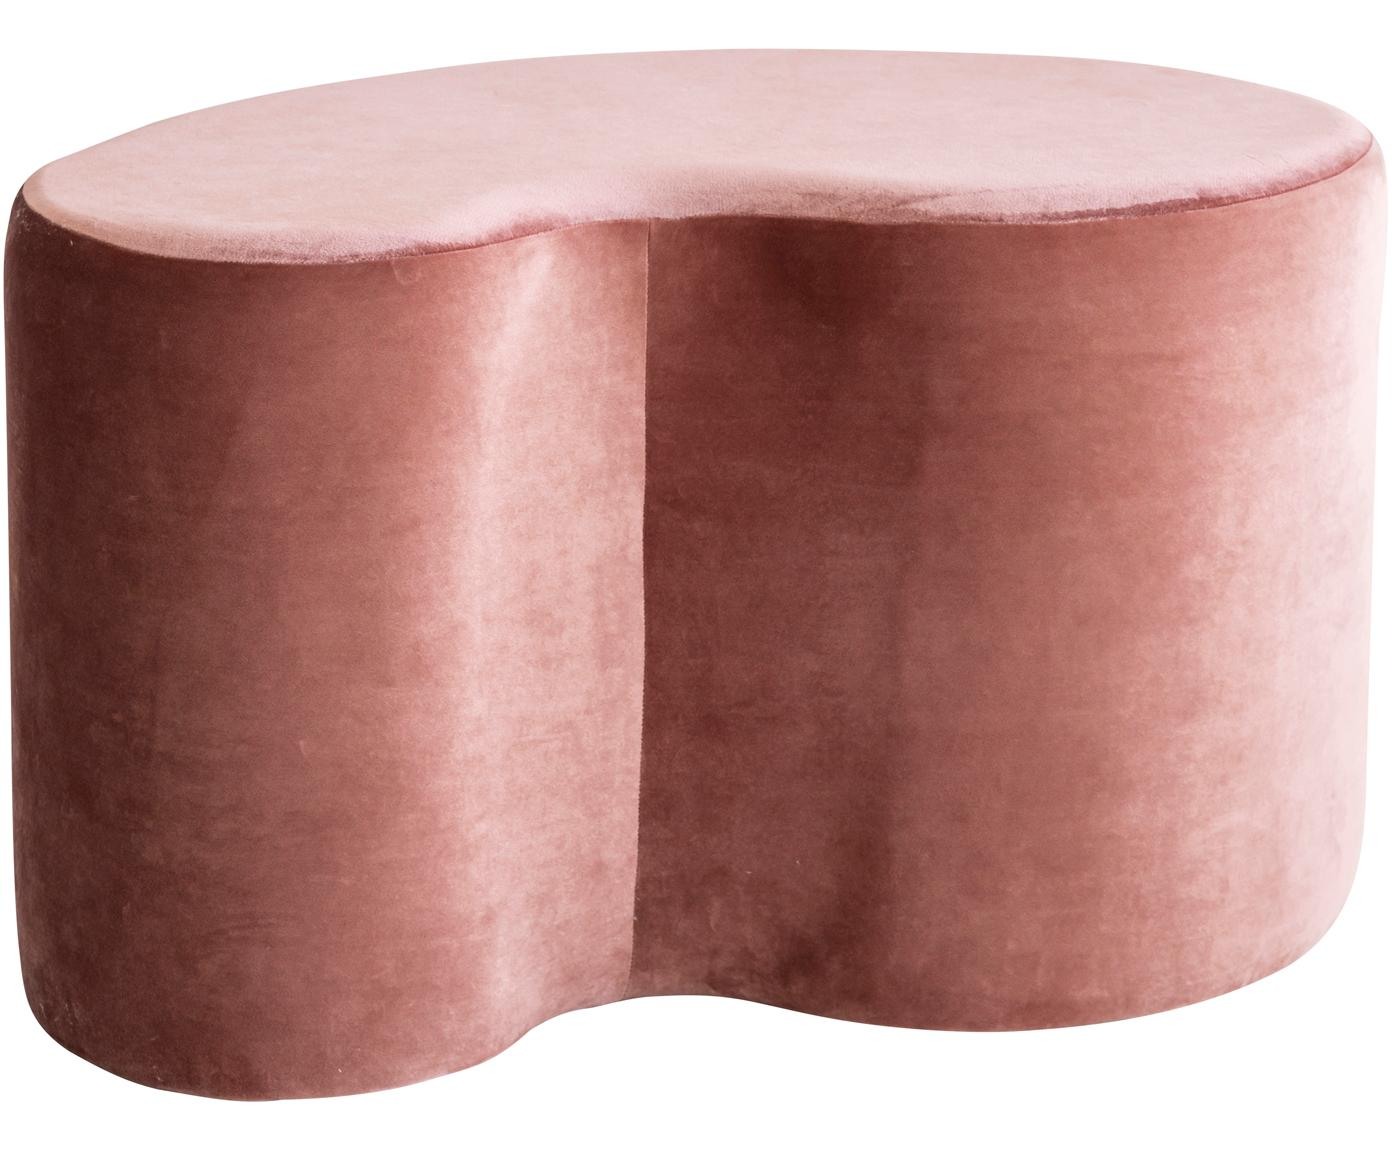 Kruk Cloe, Polyester, Roze, B 80 x D 50 cm